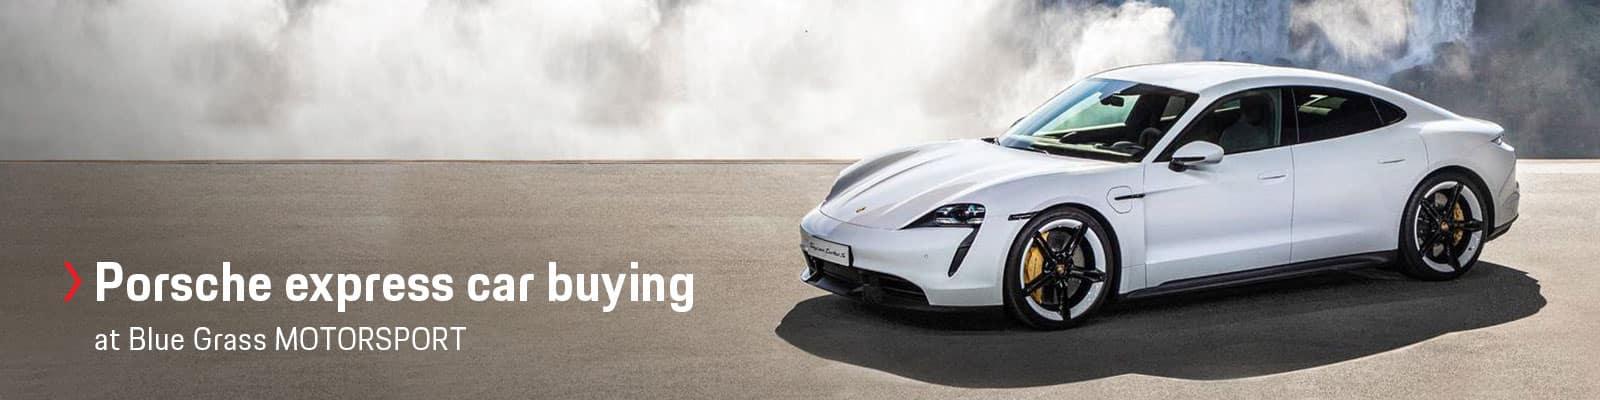 Porsche Express Car Buying